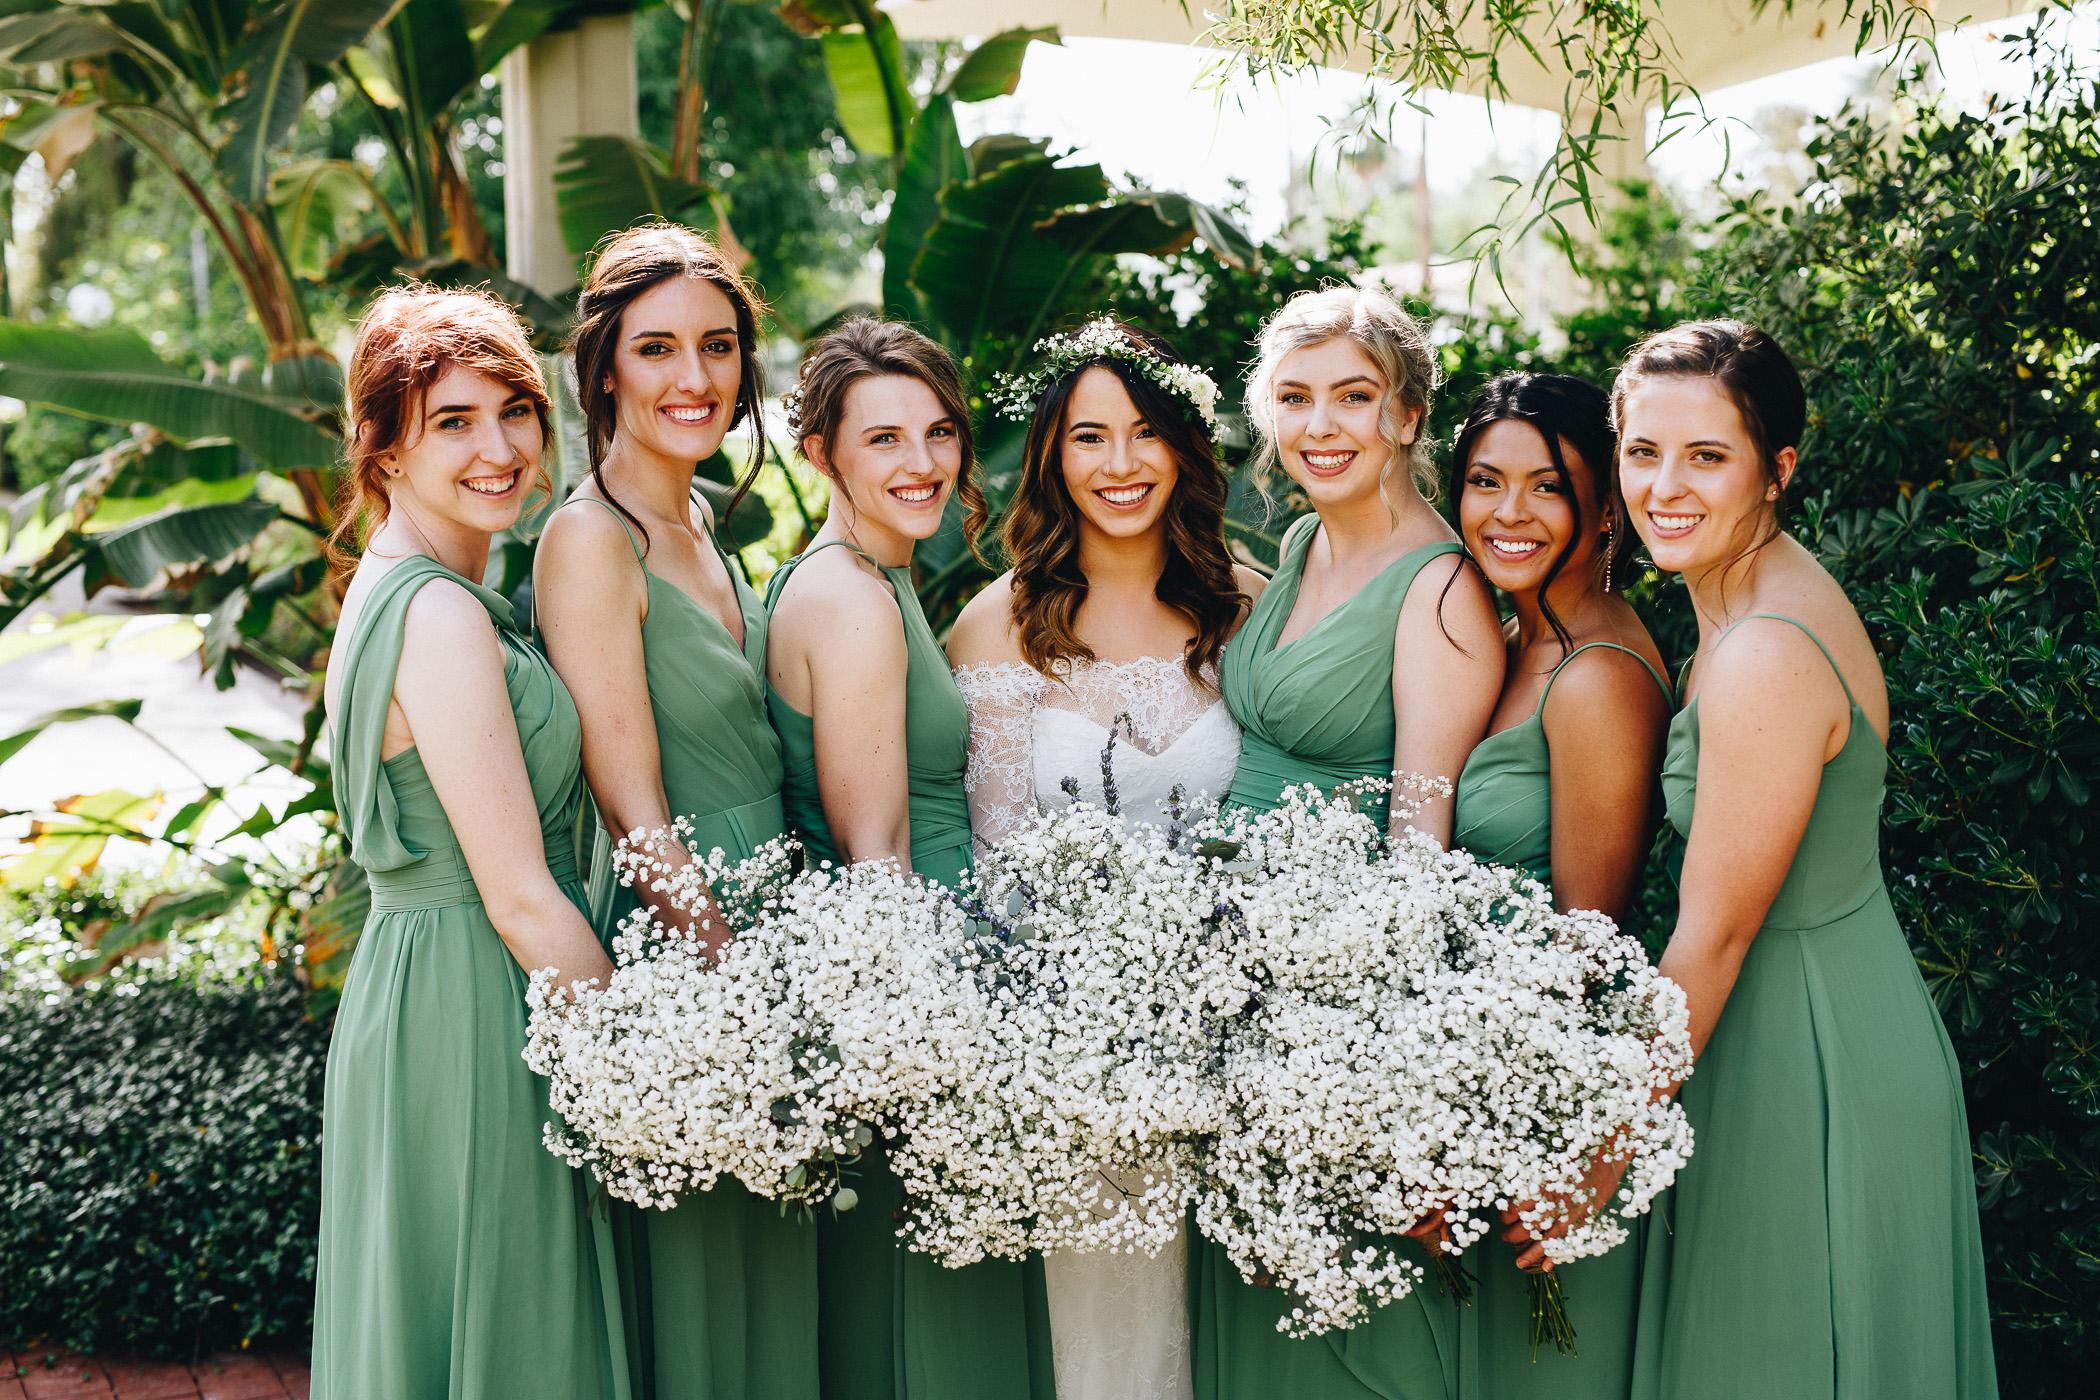 181104-Luxium-Weddings-Arizona-@matt__Le-Brandon-Kariana-Phoenix-Valley-Garden-Center-1019.jpg